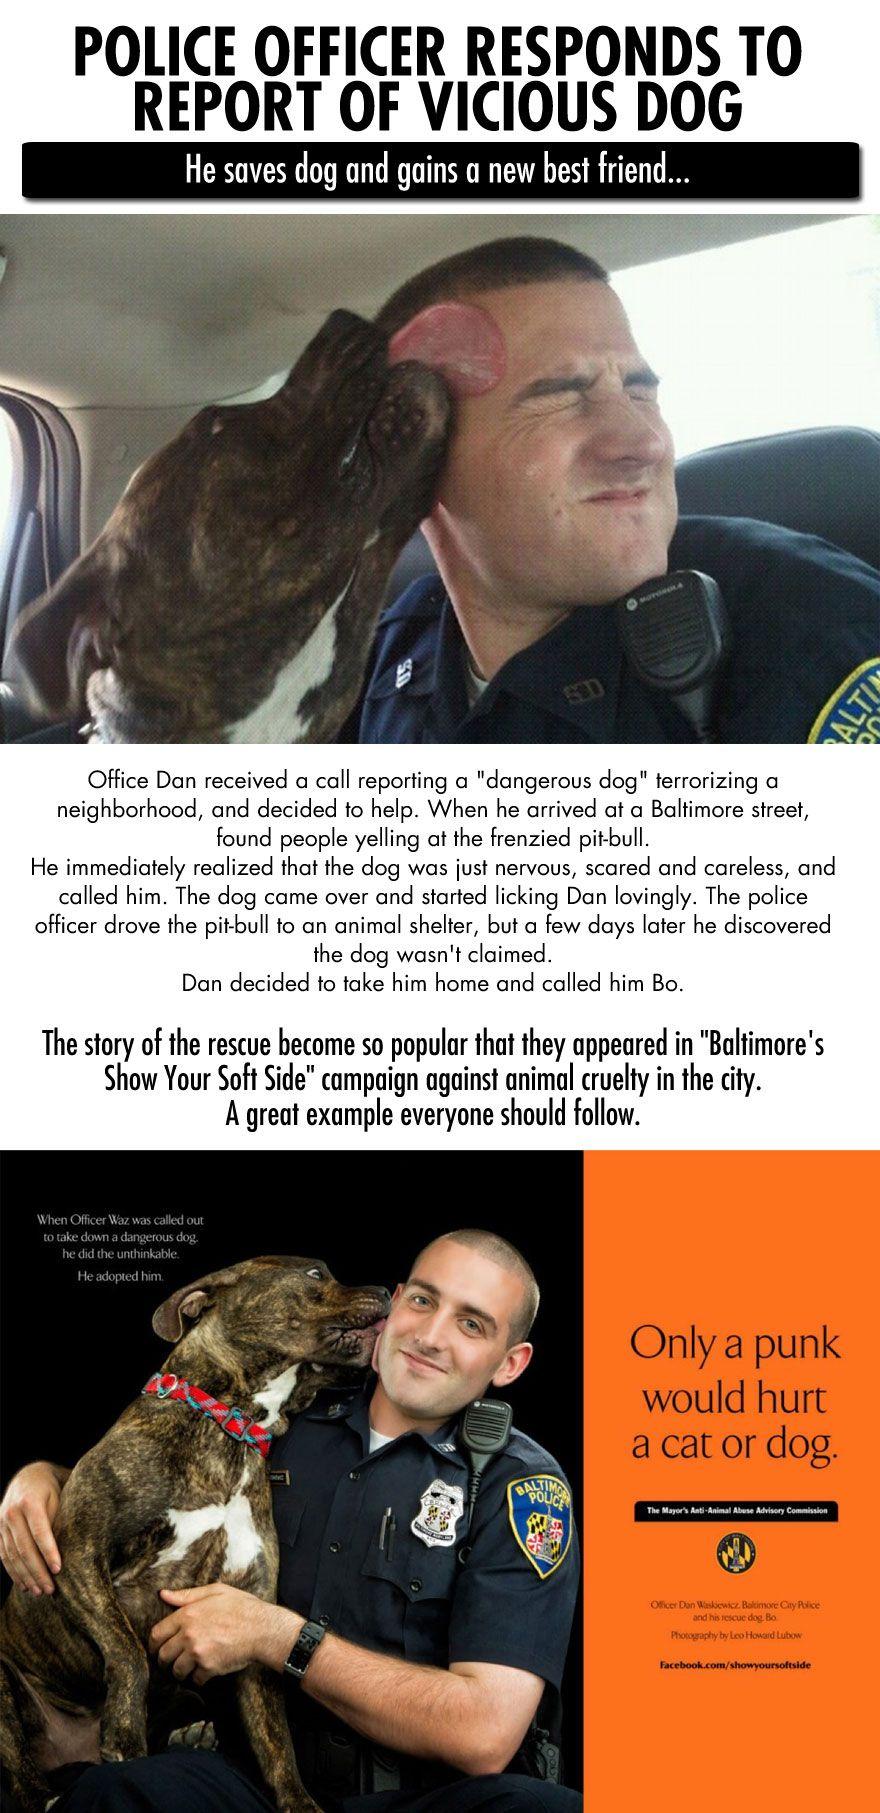 Hero Baltimore cop saves dog, gains new best friend… Good Guy!